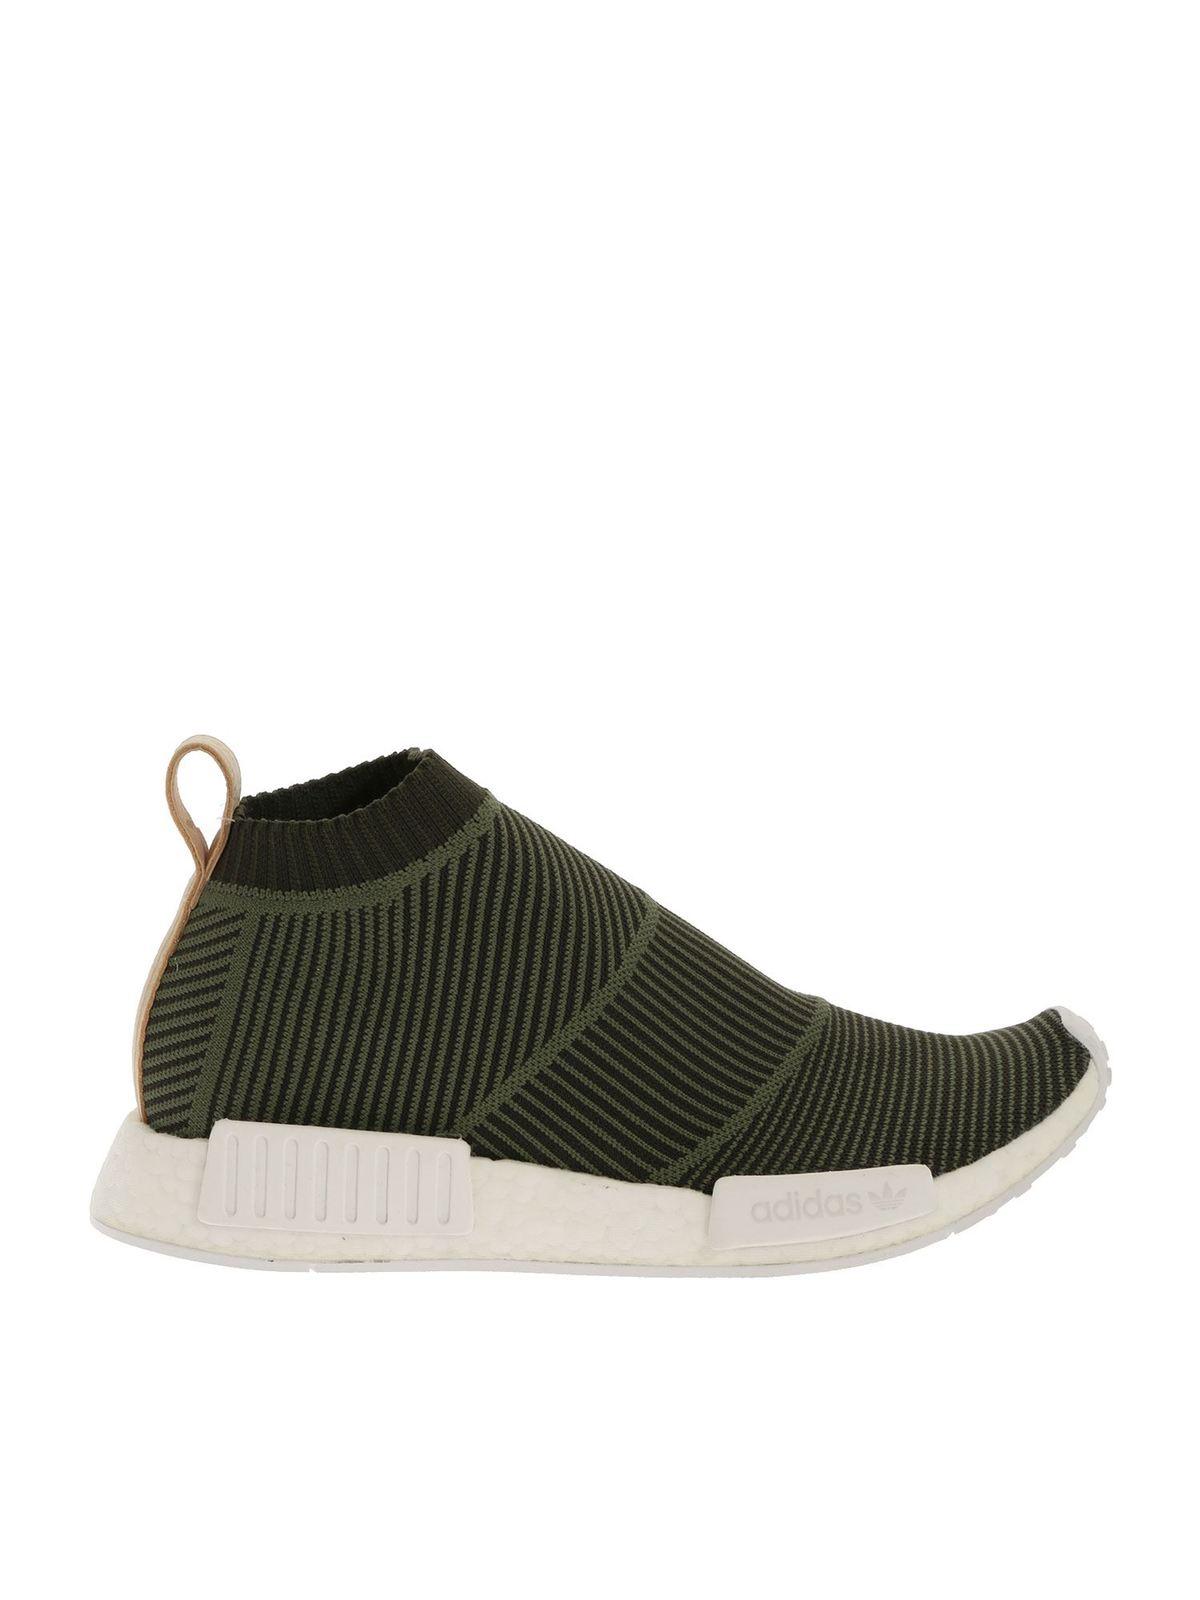 Adidas Originals - NMD CS1 Primeknit sneakers in green - trainers ...